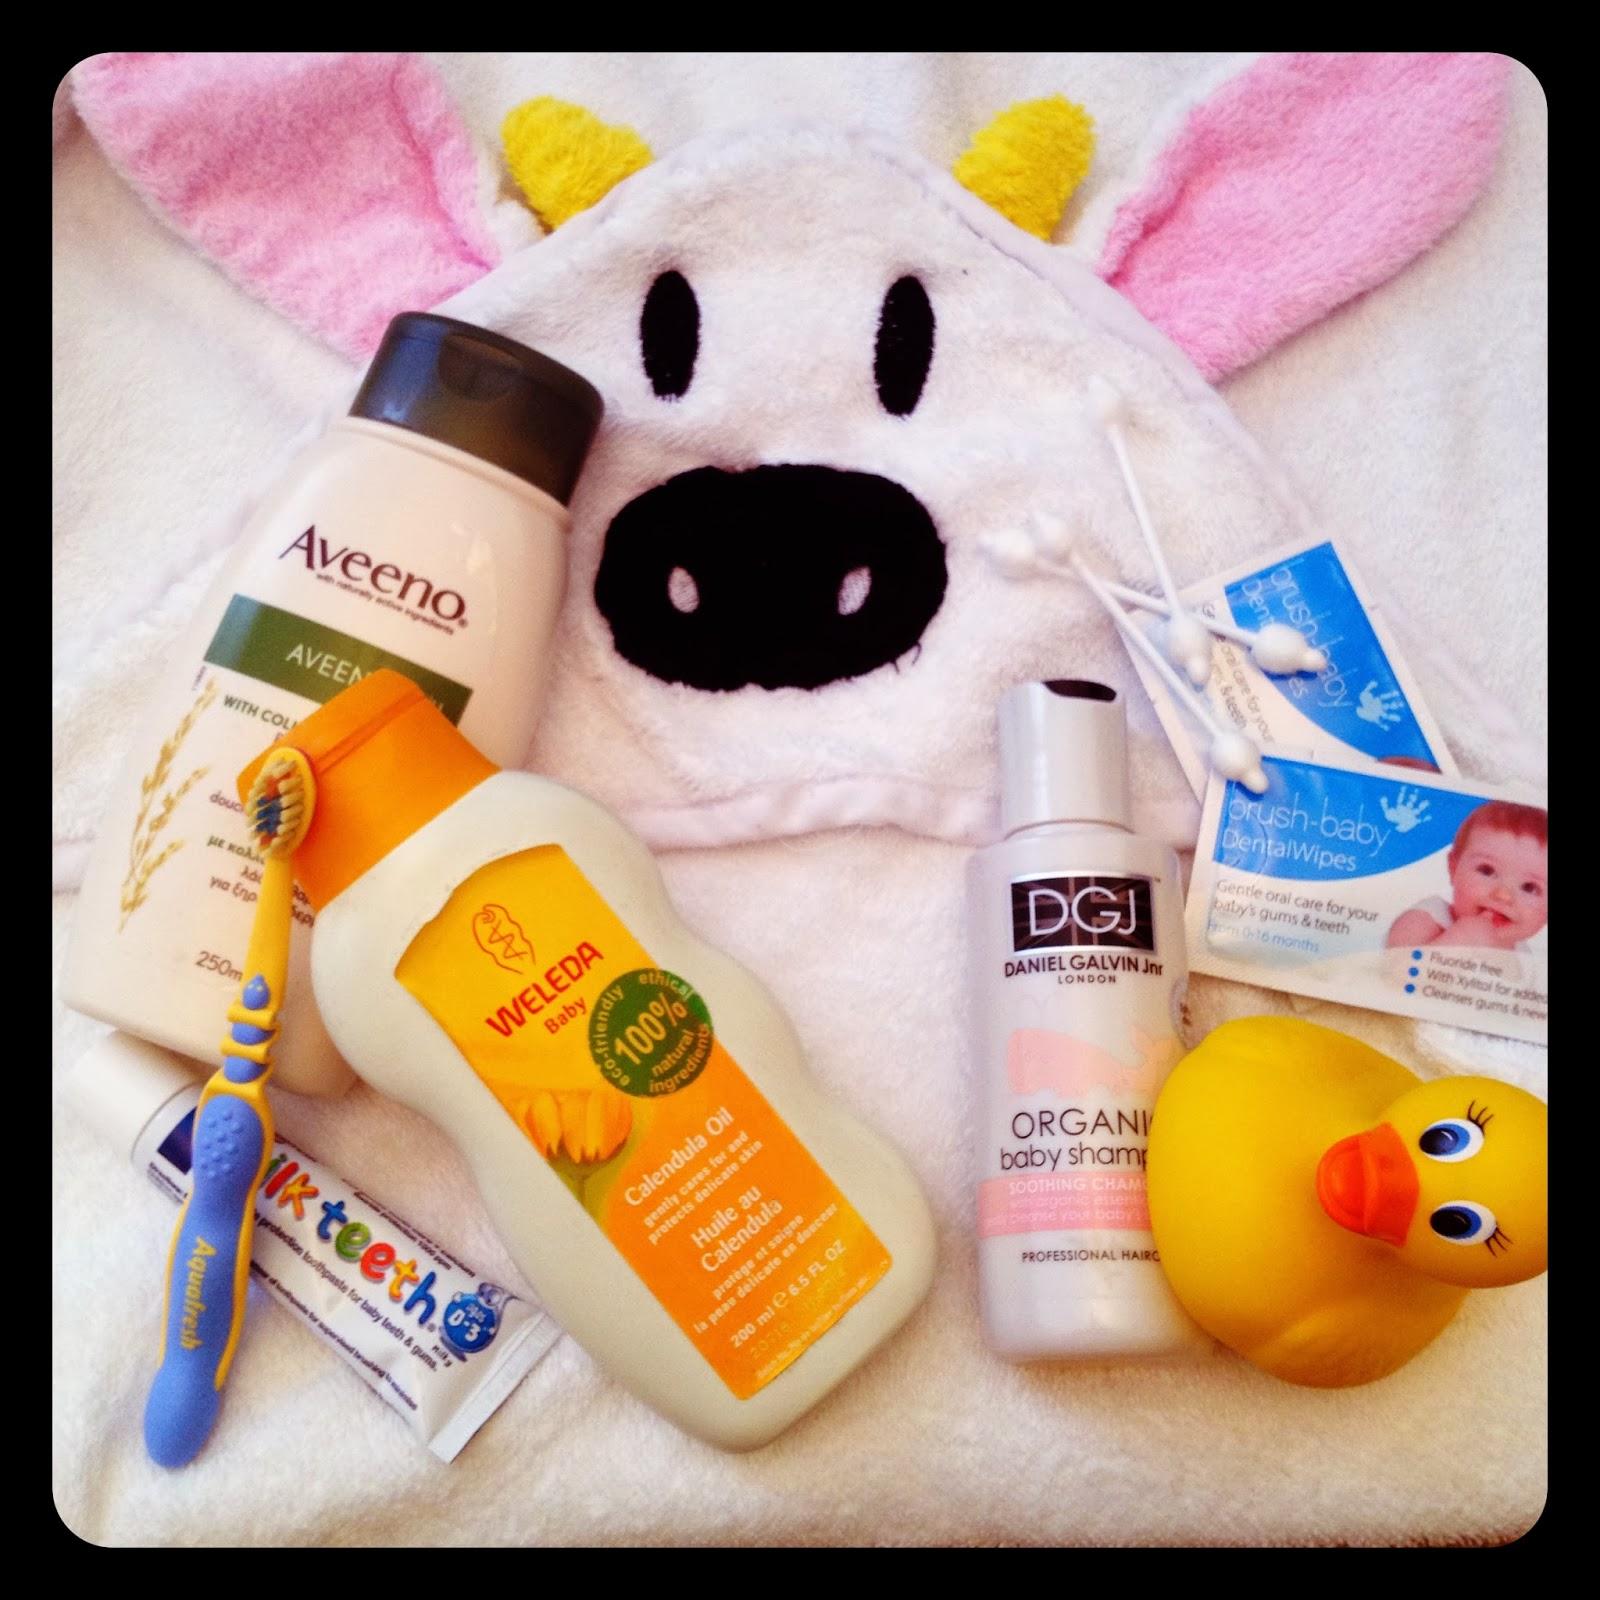 mamasVIB | V. I. BEAUTY: Our 9 top bath time routine essentials for a peaceful evening, V. I. BATHTIME| Bath time routine essentials | baby beauty| bath time | baby bath | mamasVIB